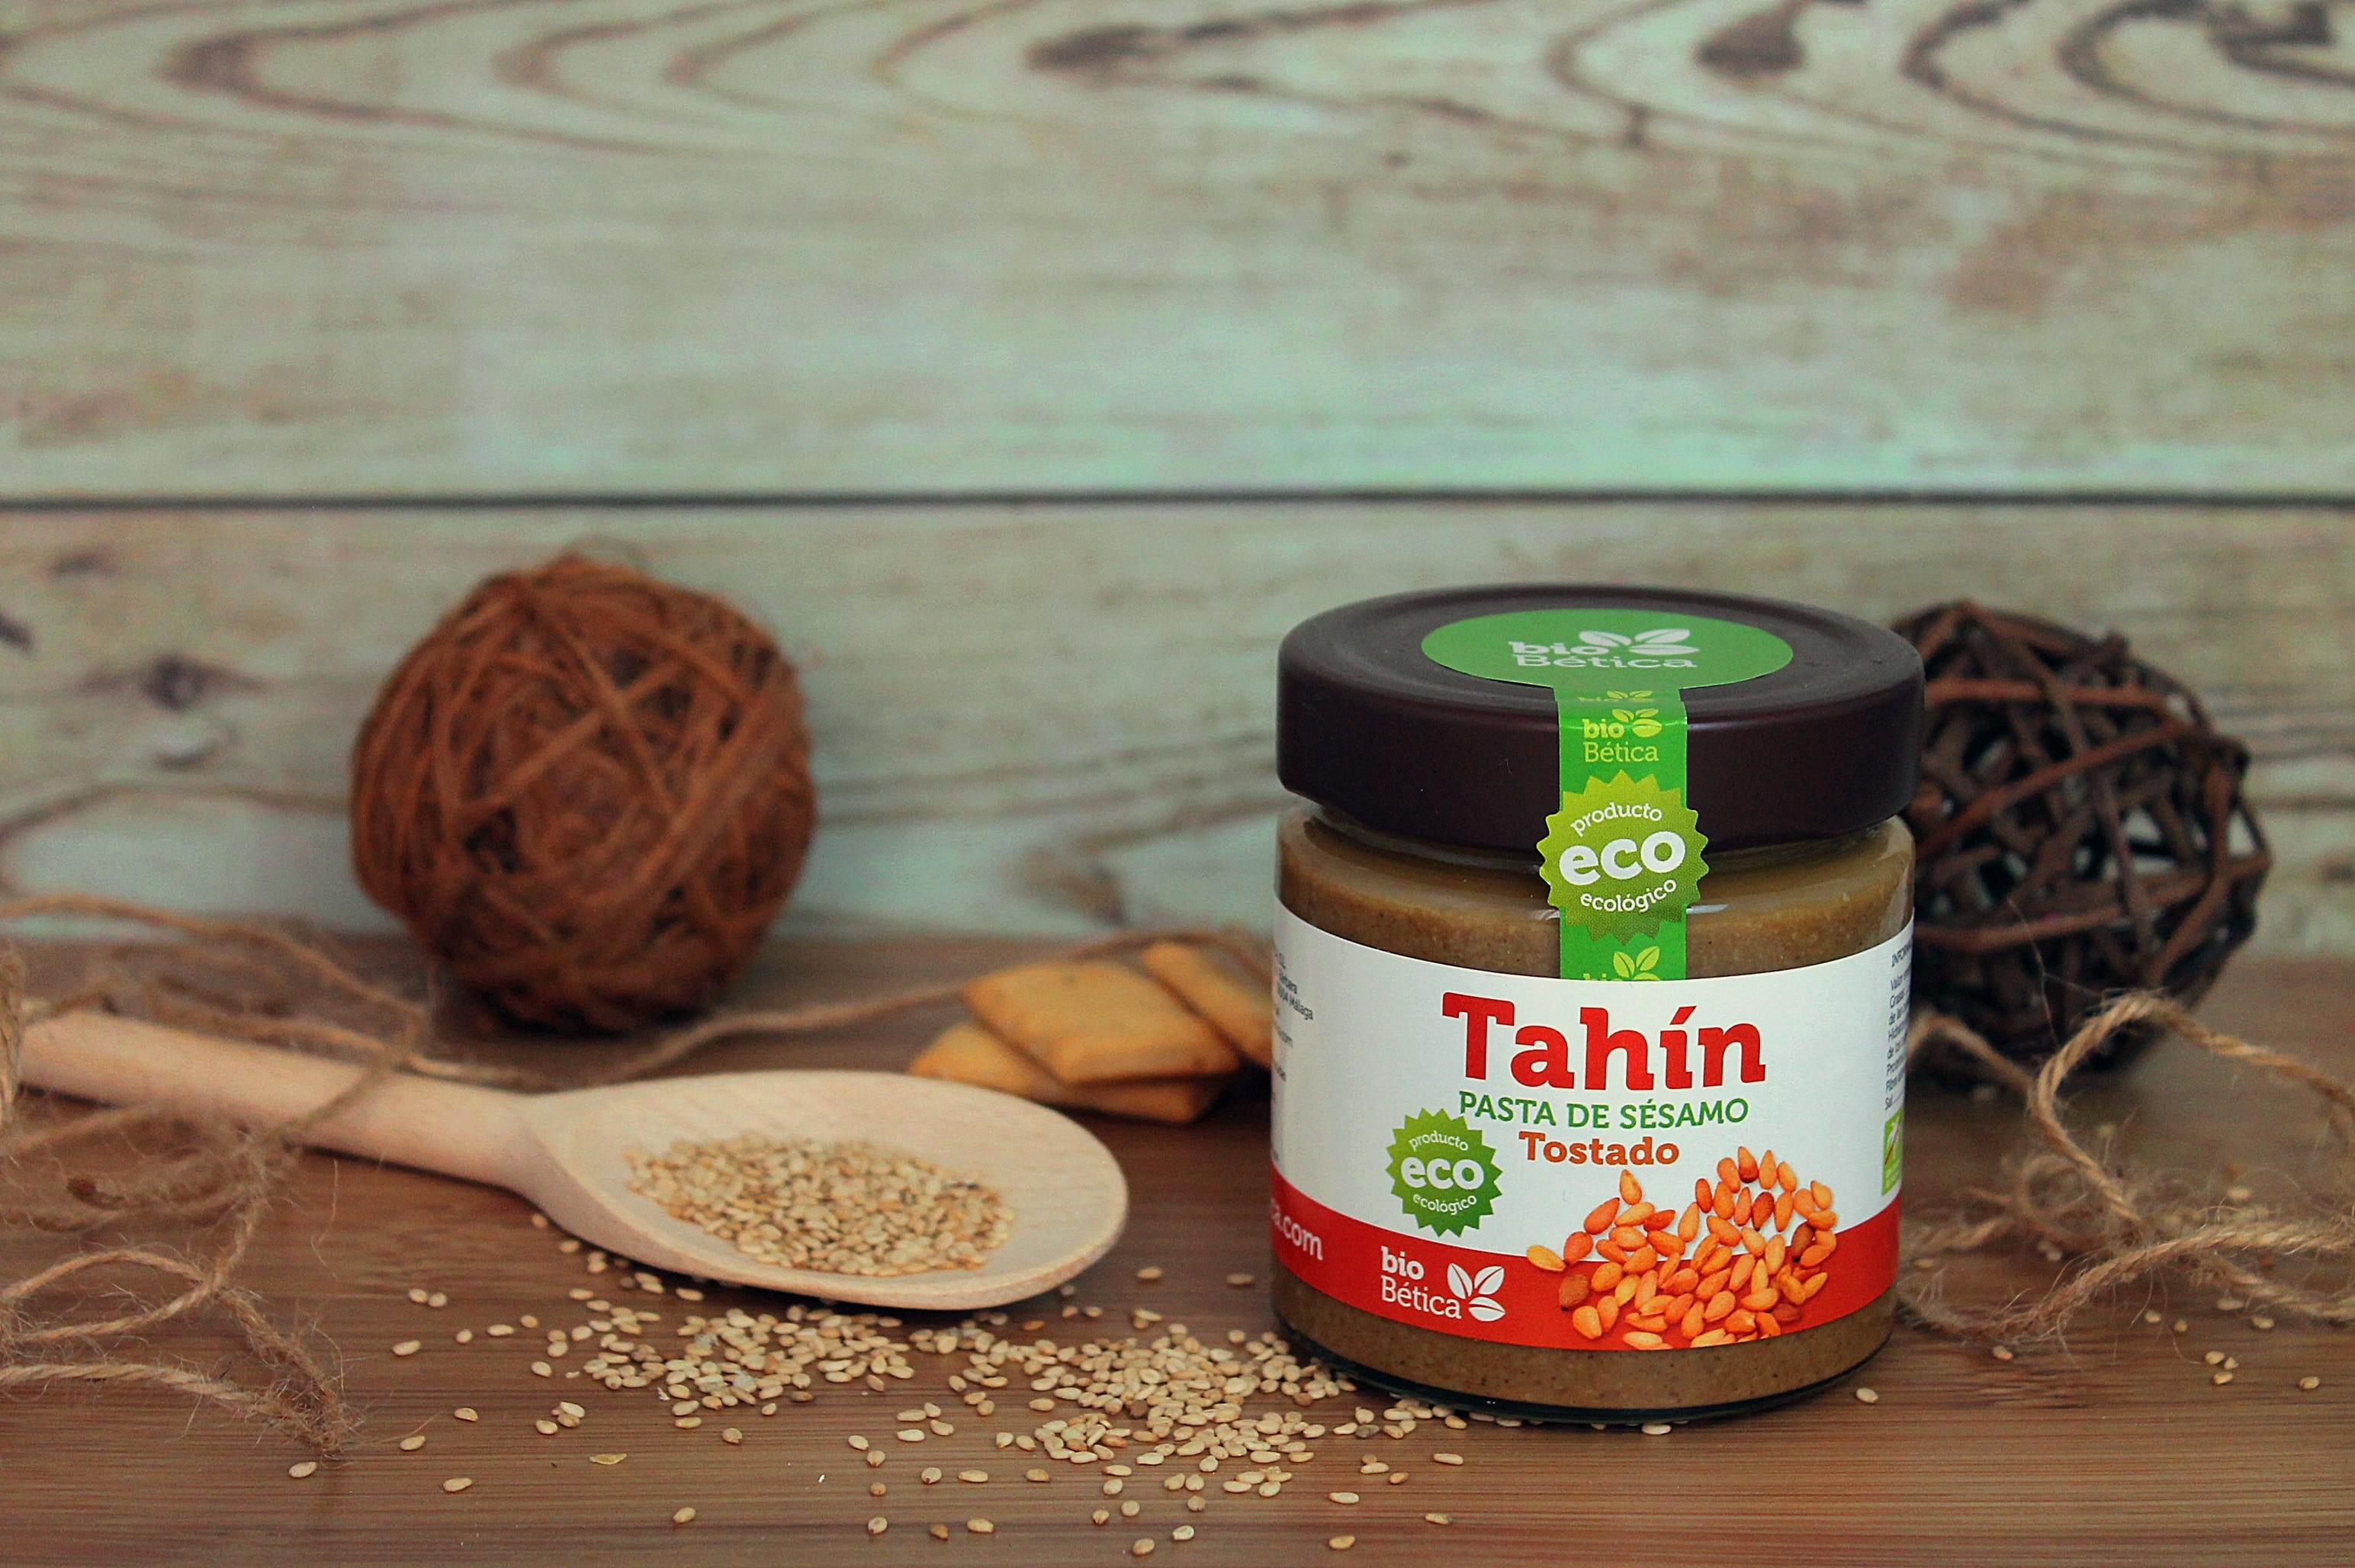 Tahín roasted-roasted sesame paste-GLUTEN free-no Milk-no egg-no oil PALMA 2 units